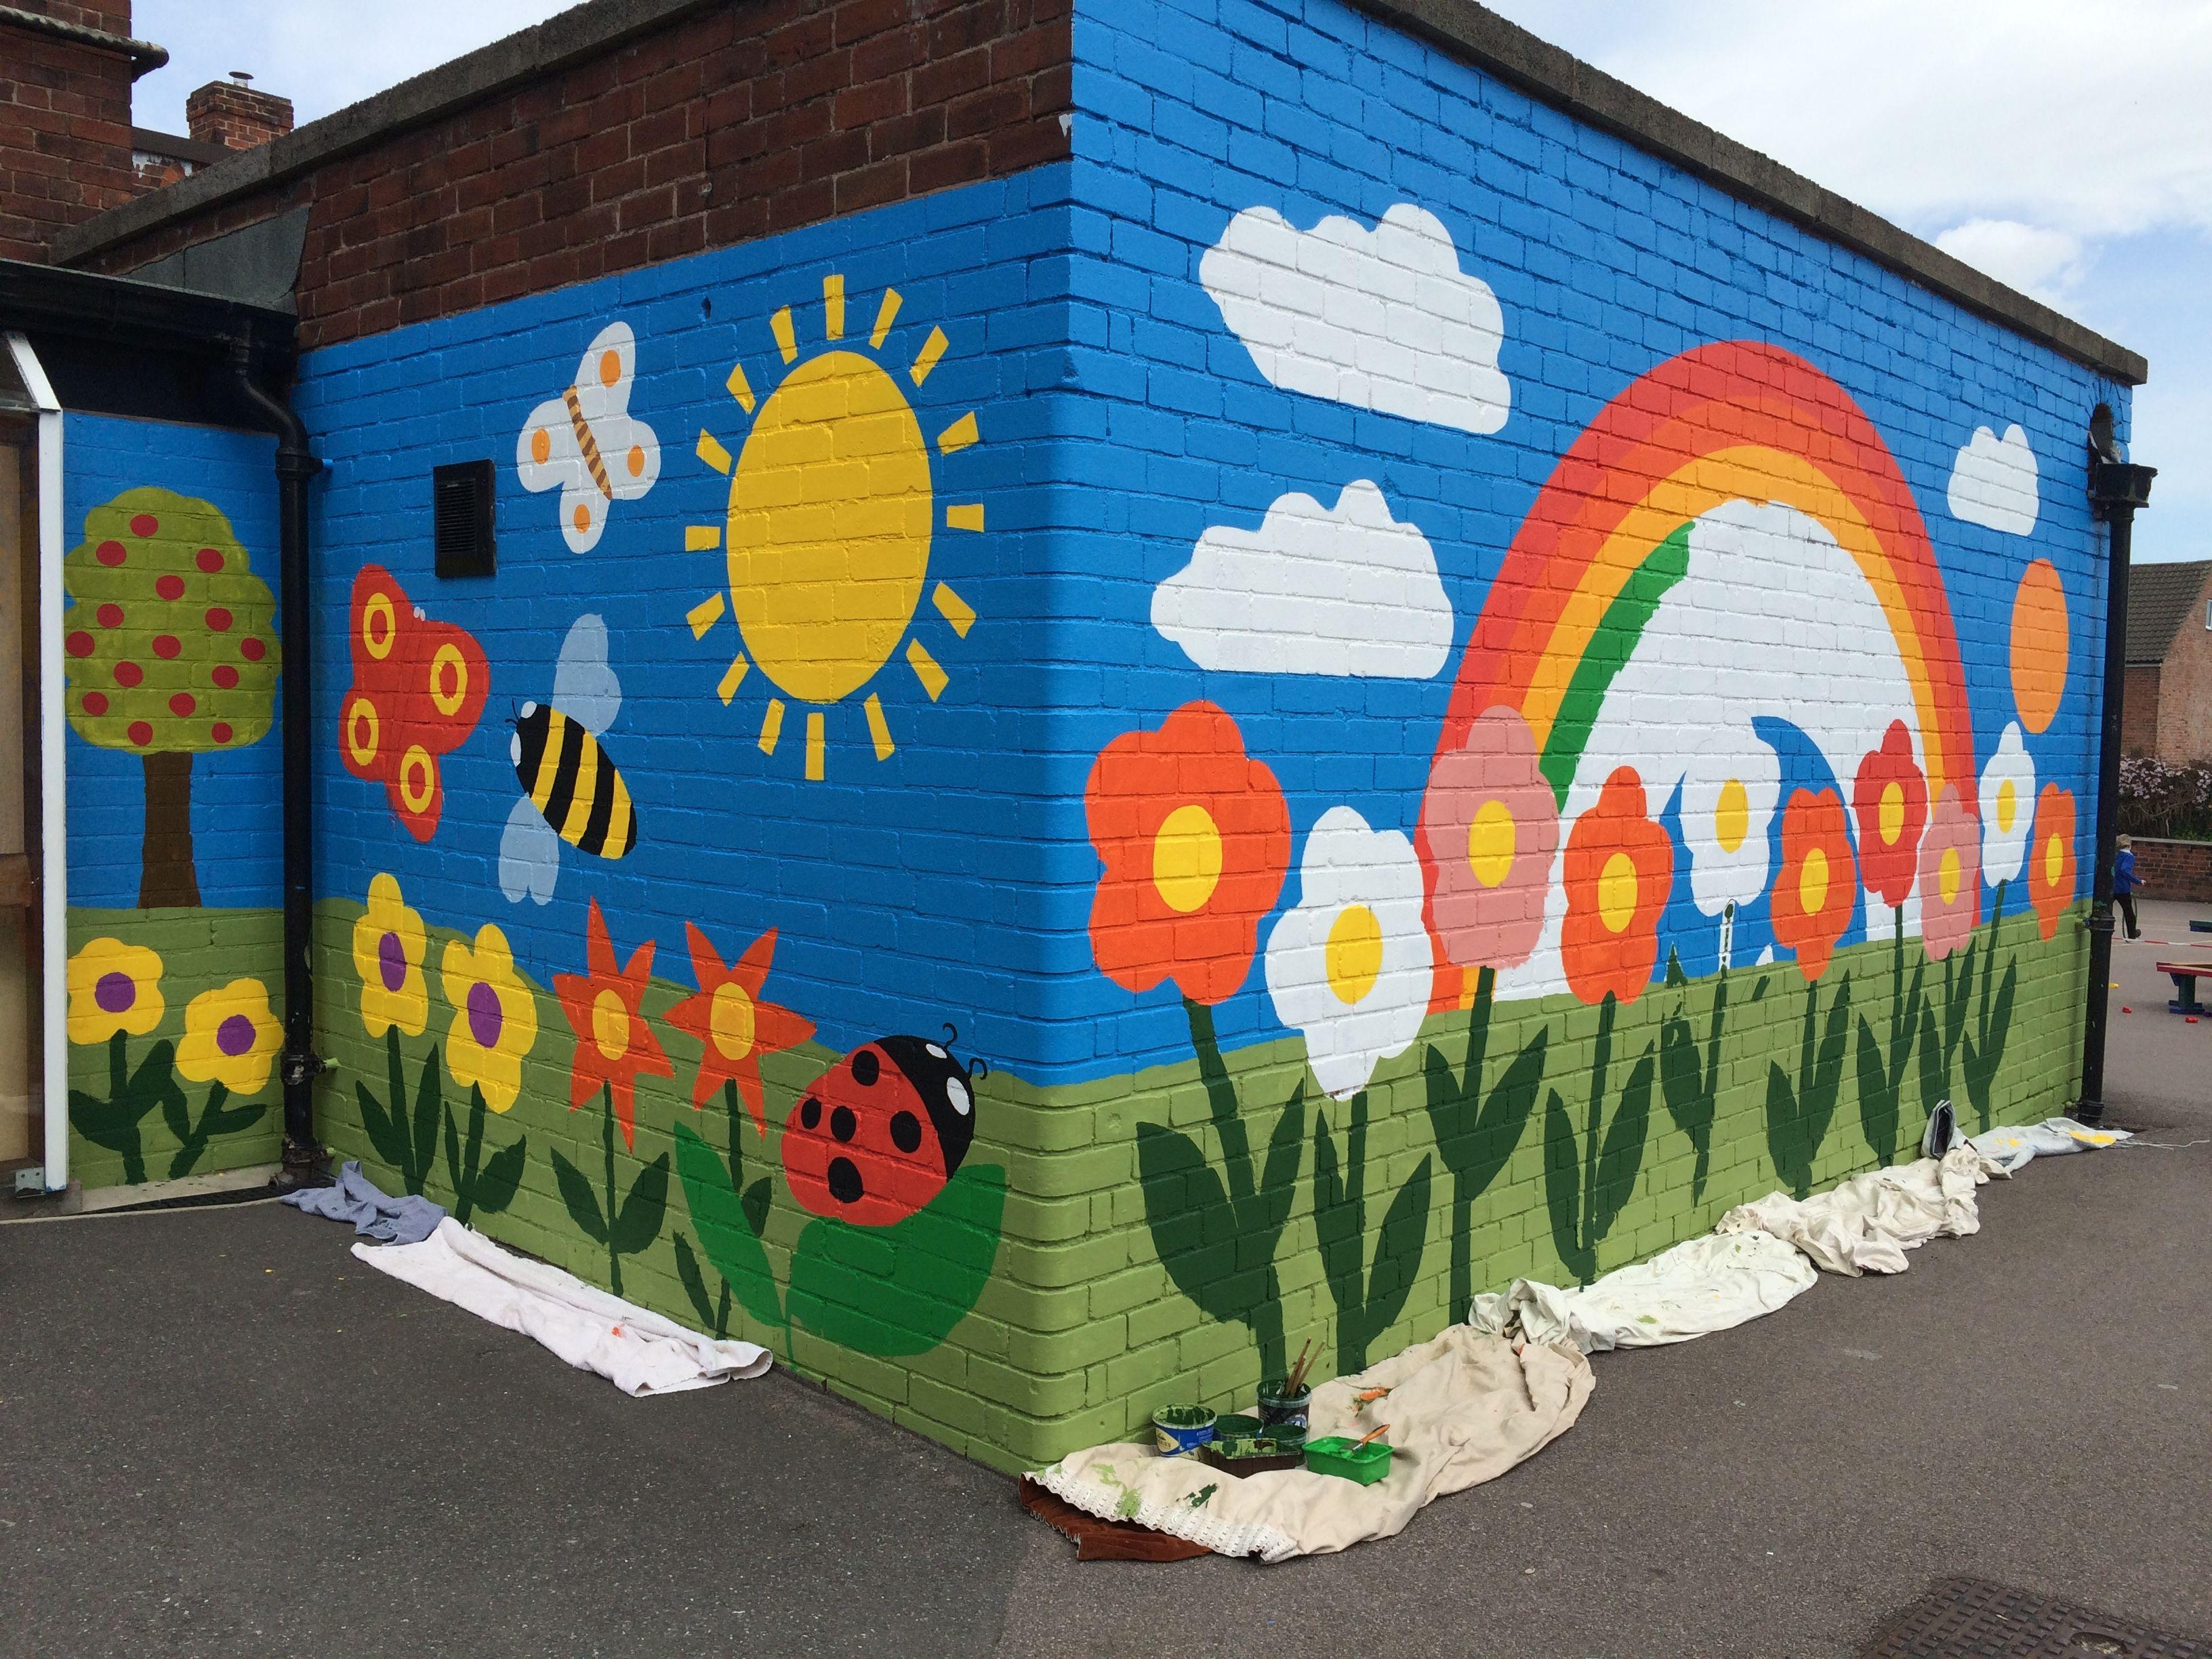 New Whittington Primary School Mural Junction Arts Skool Muur